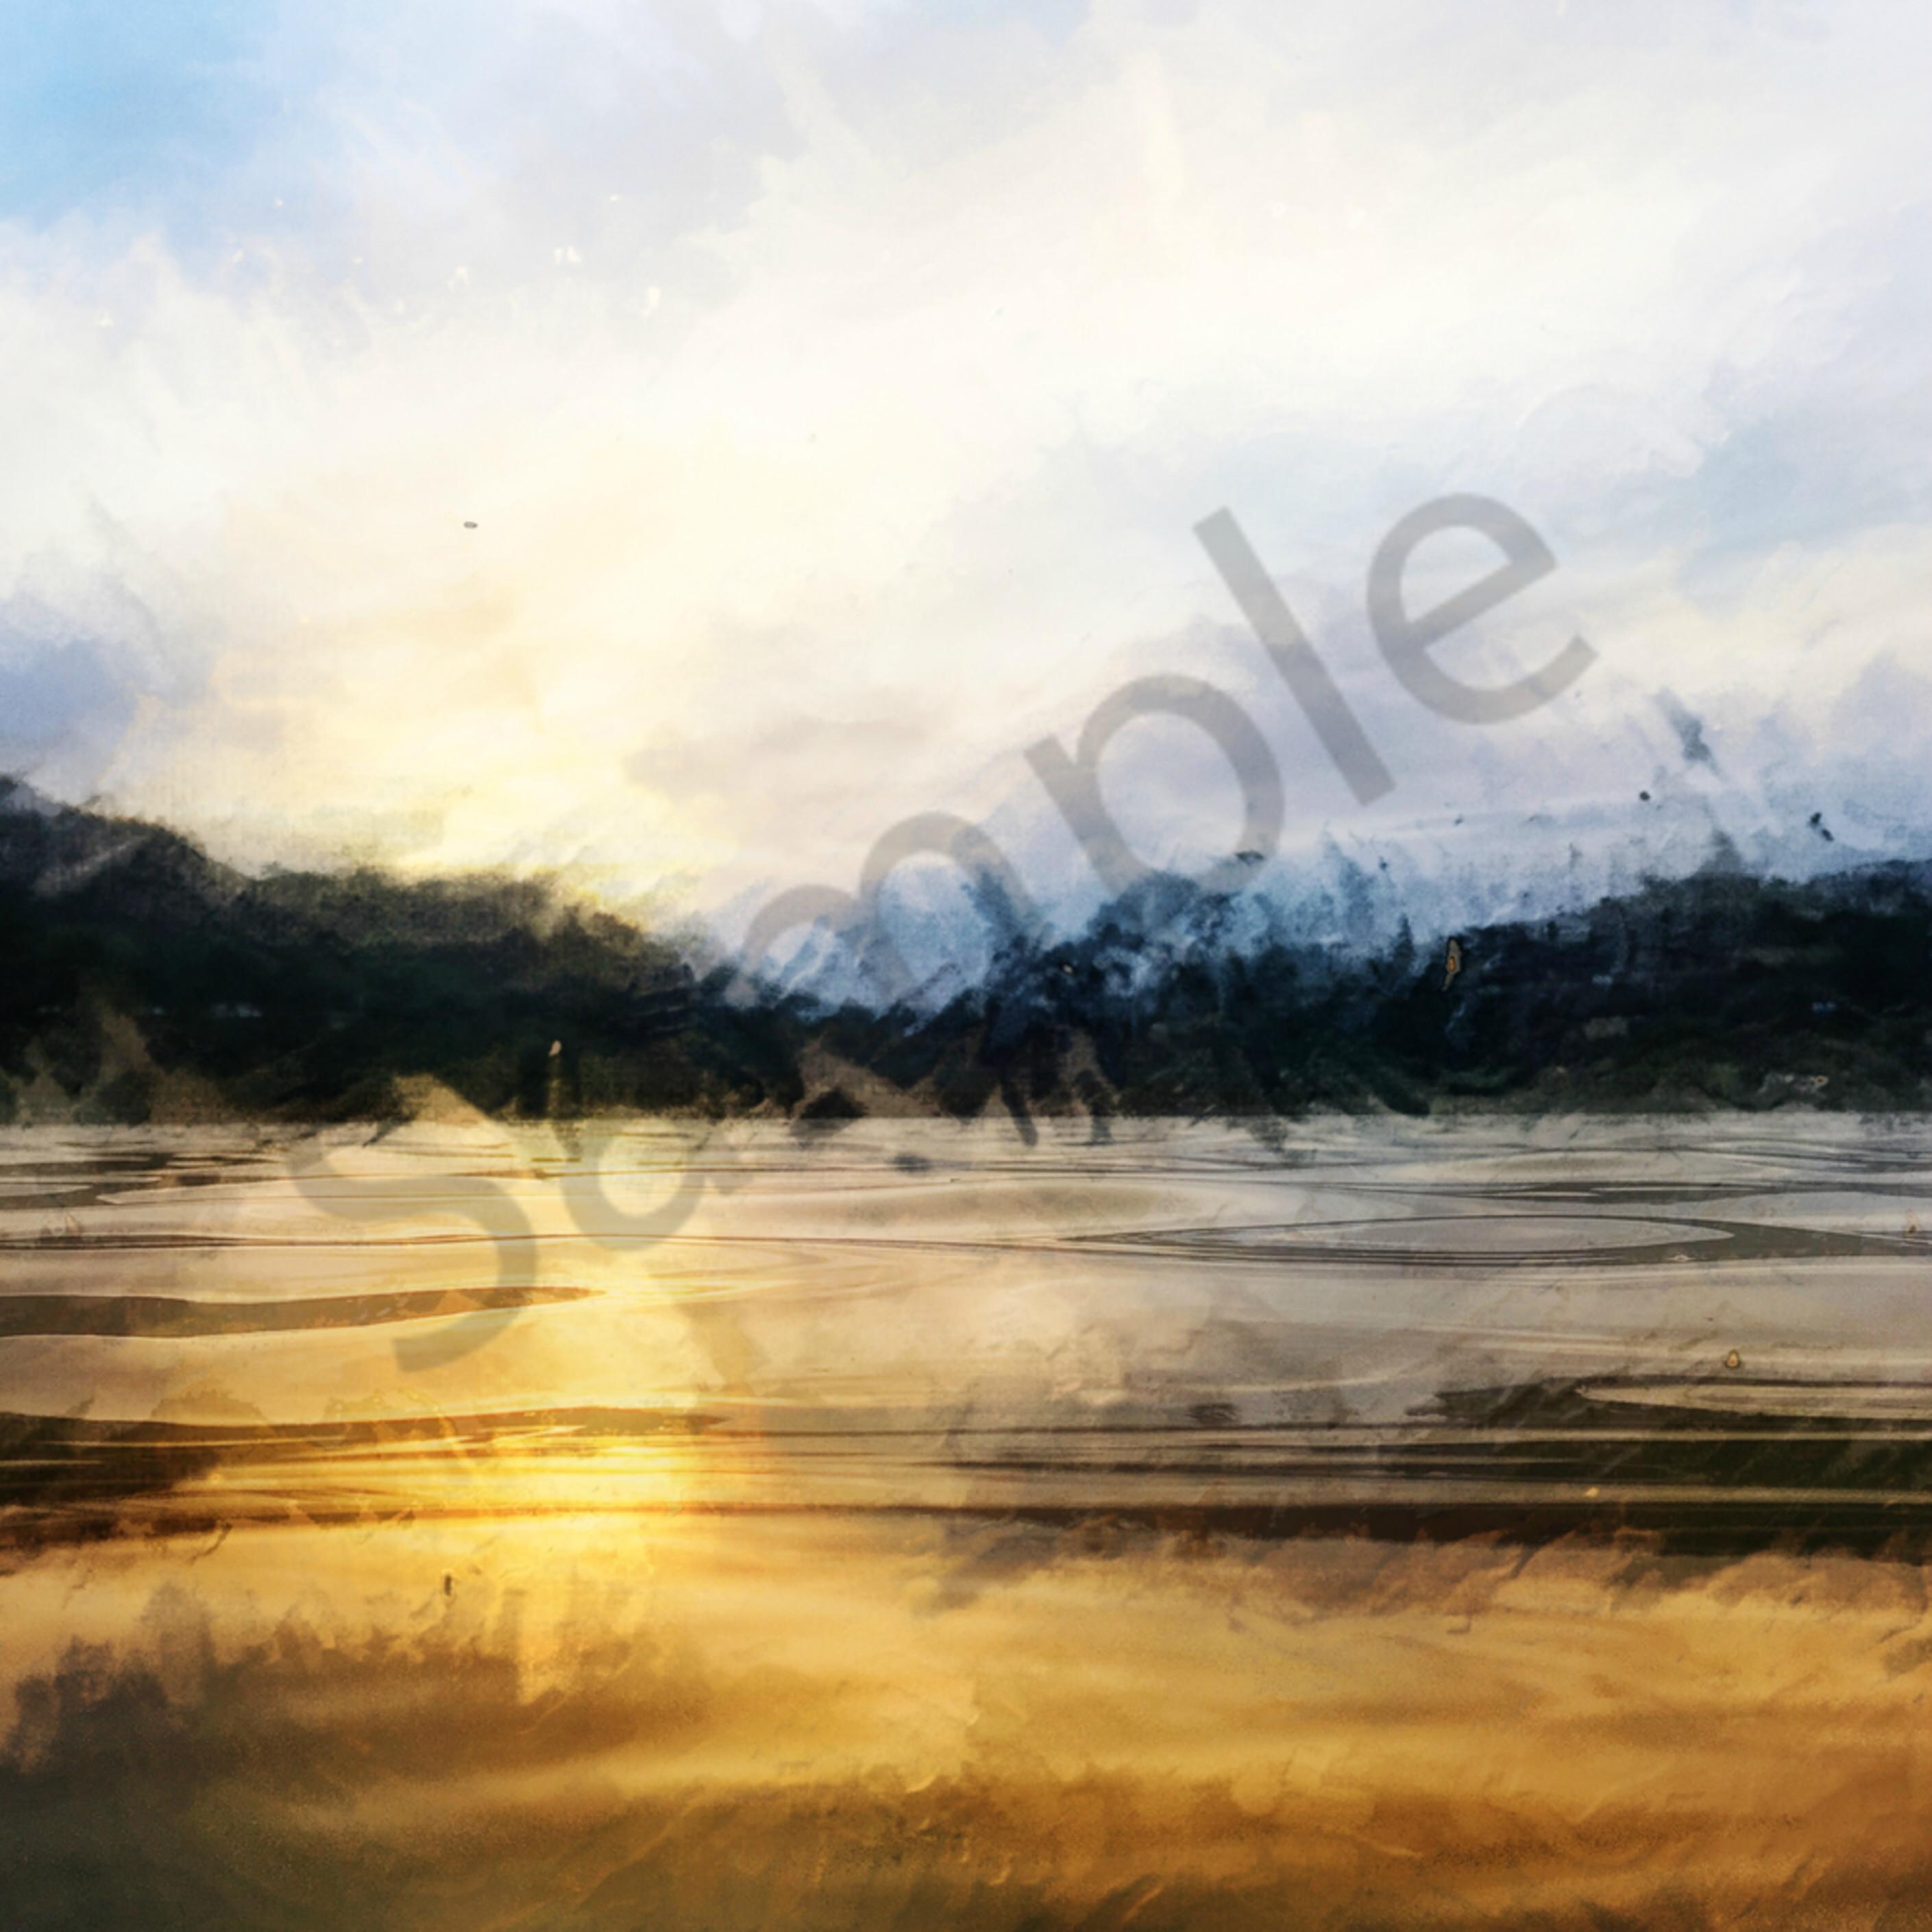 Water of wisdom   img 6928 lake dixon abstract reflecion 2018   enlight edit art4theglryofgod txhjth